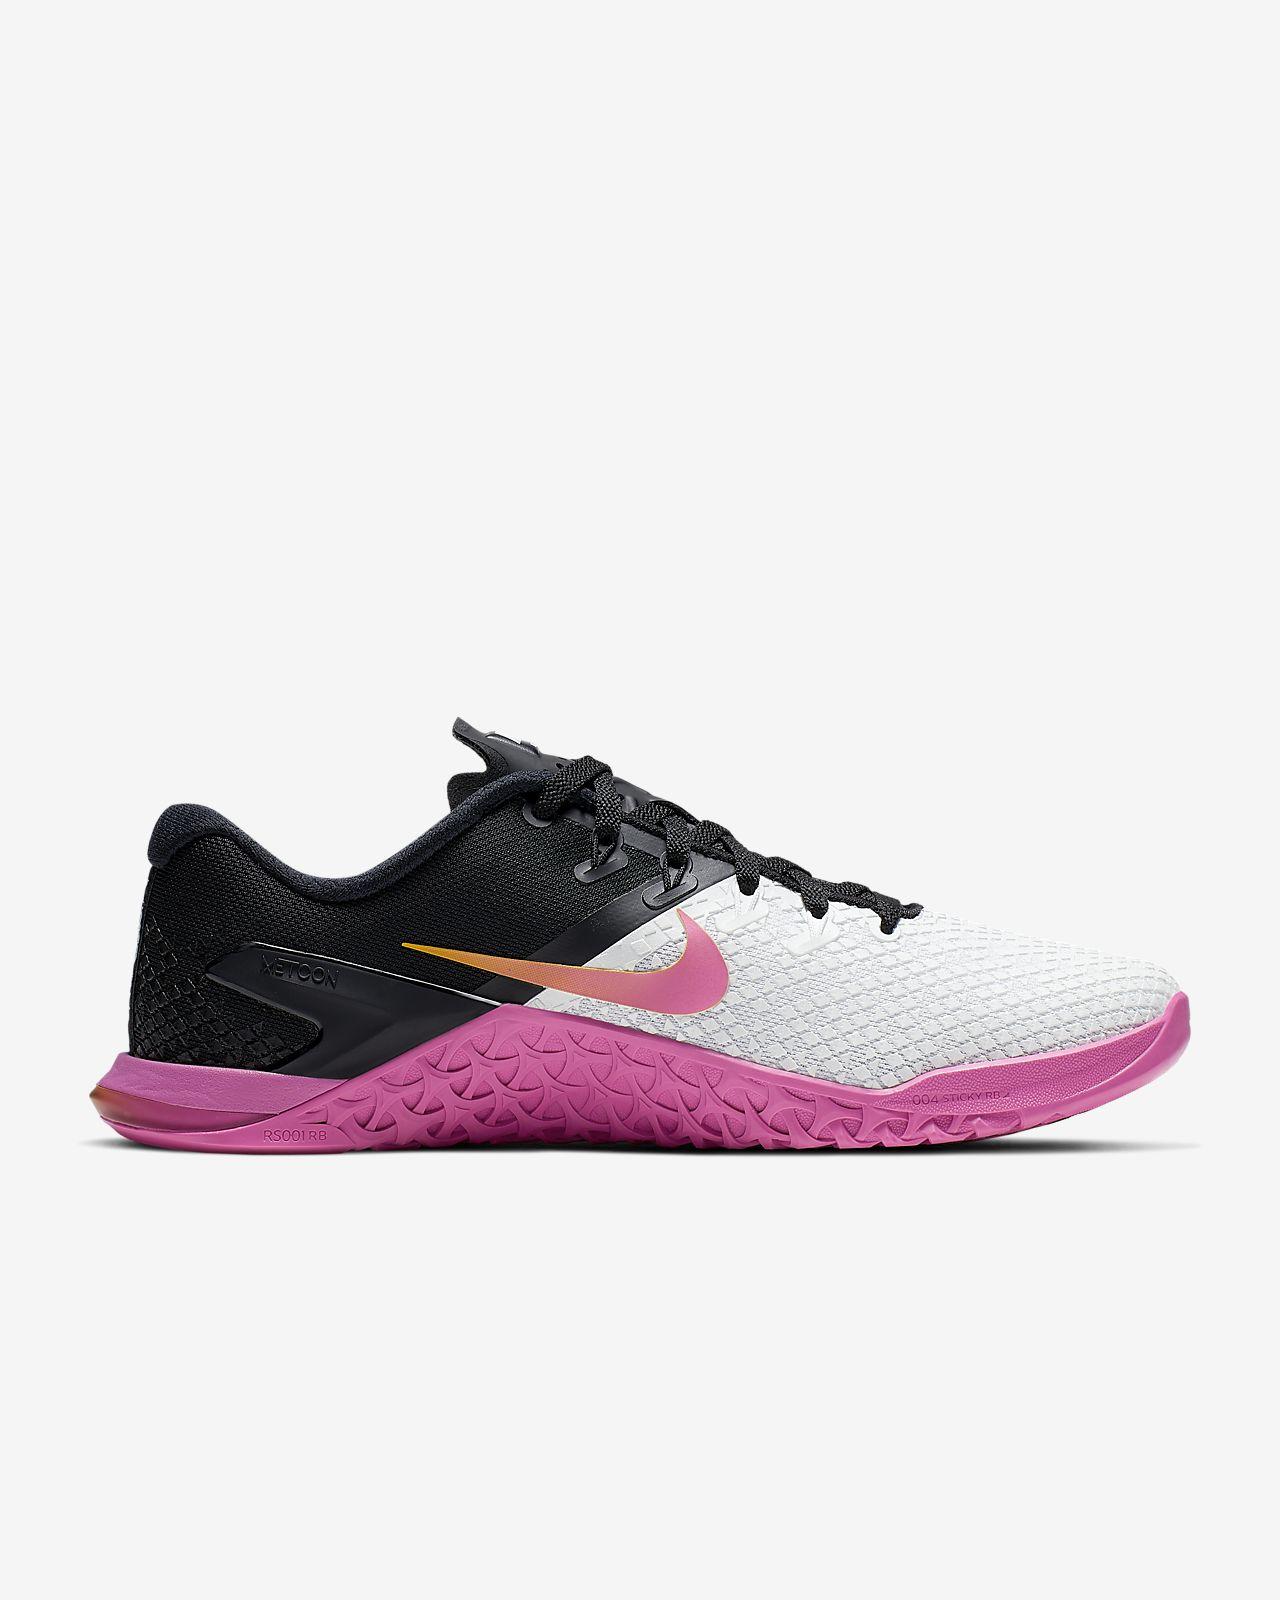 a8c7b8b67101 Nike Metcon 4 XD Women s Cross-Training Weightlifting Shoe. Nike.com AU